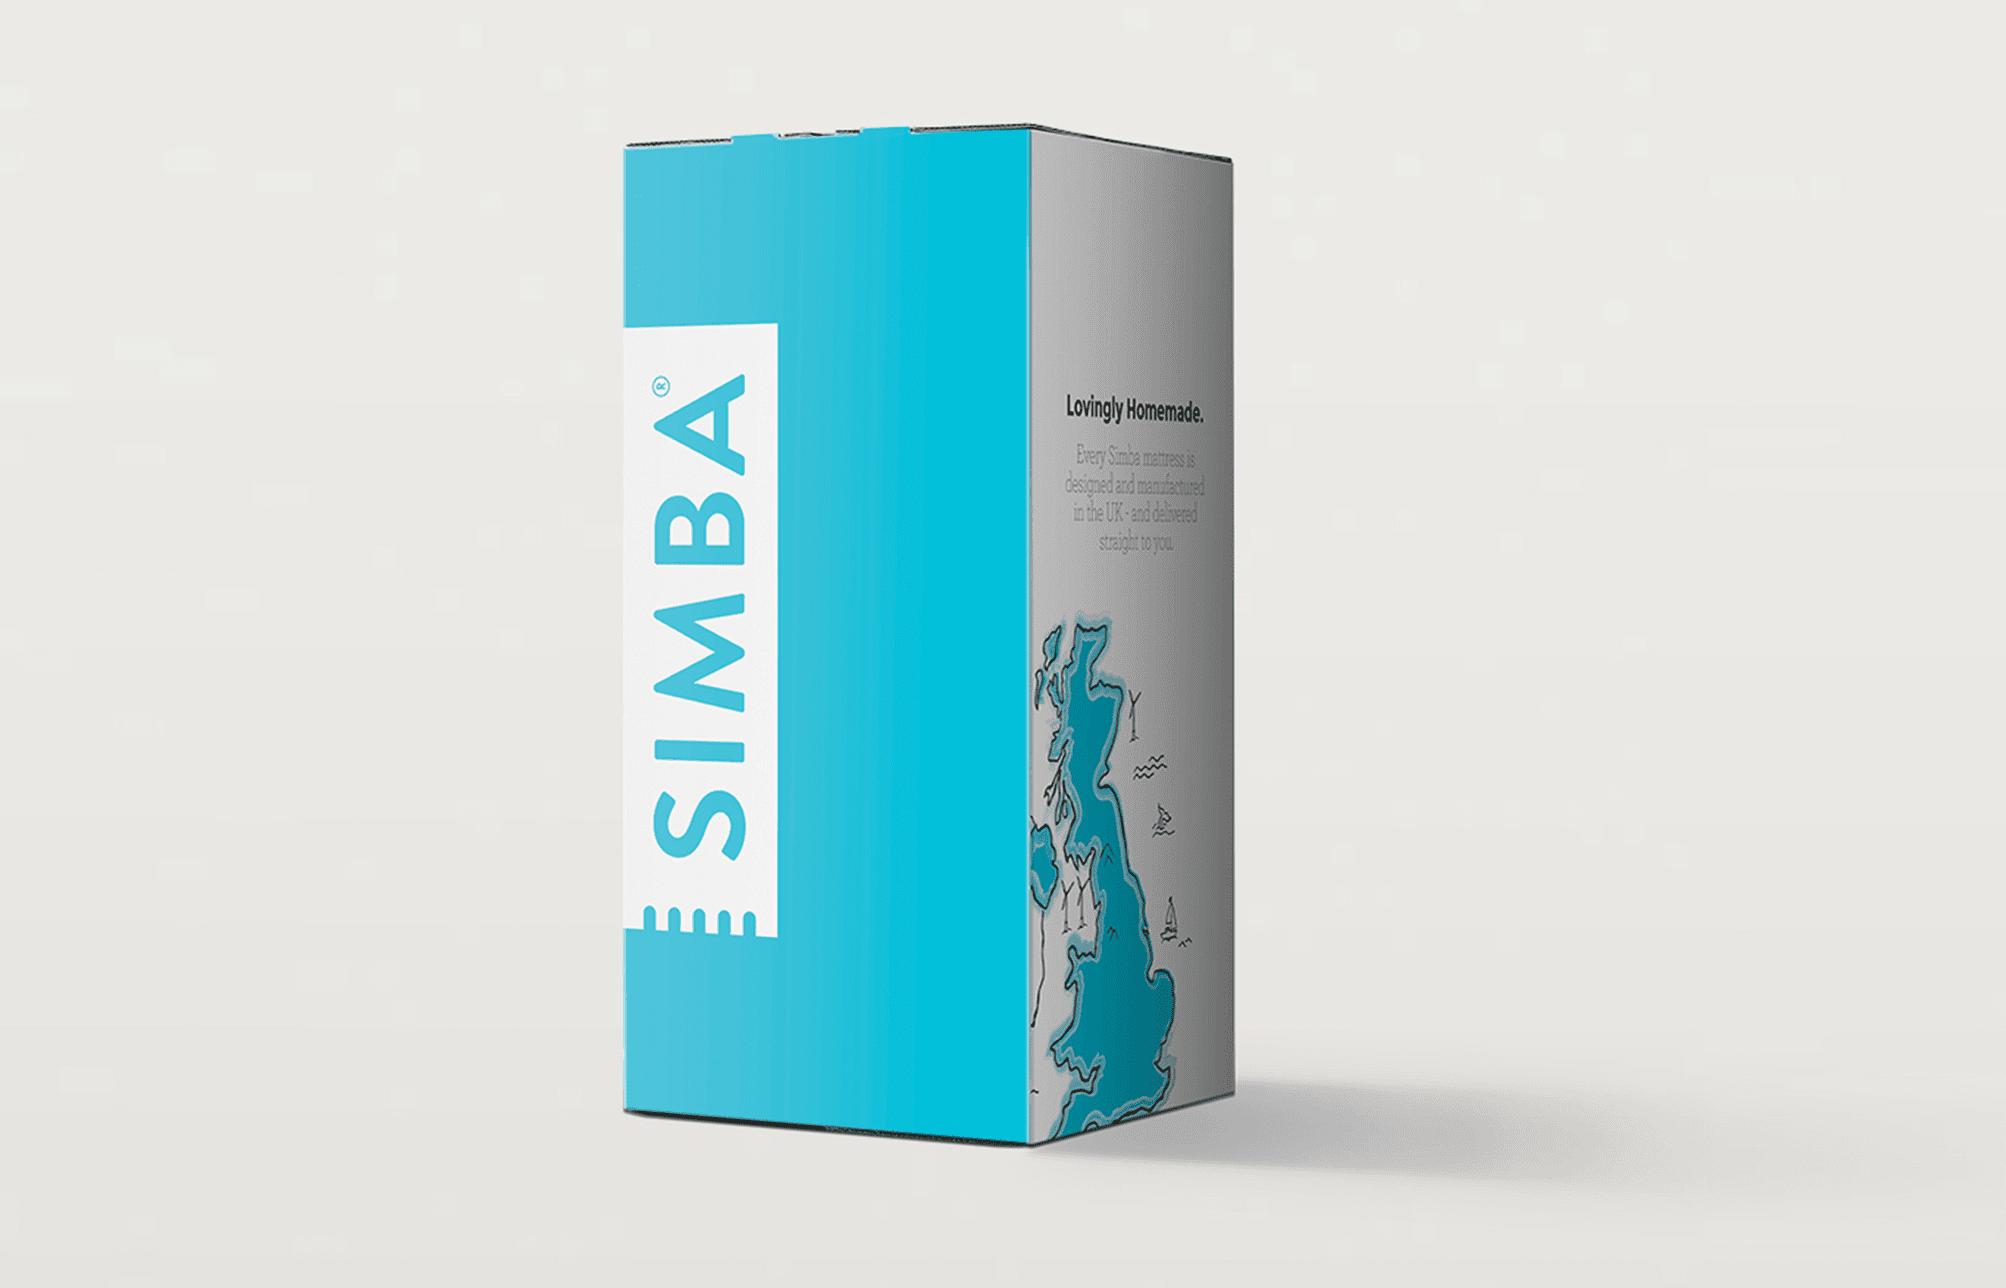 Simba matelas : le carton d'emballage